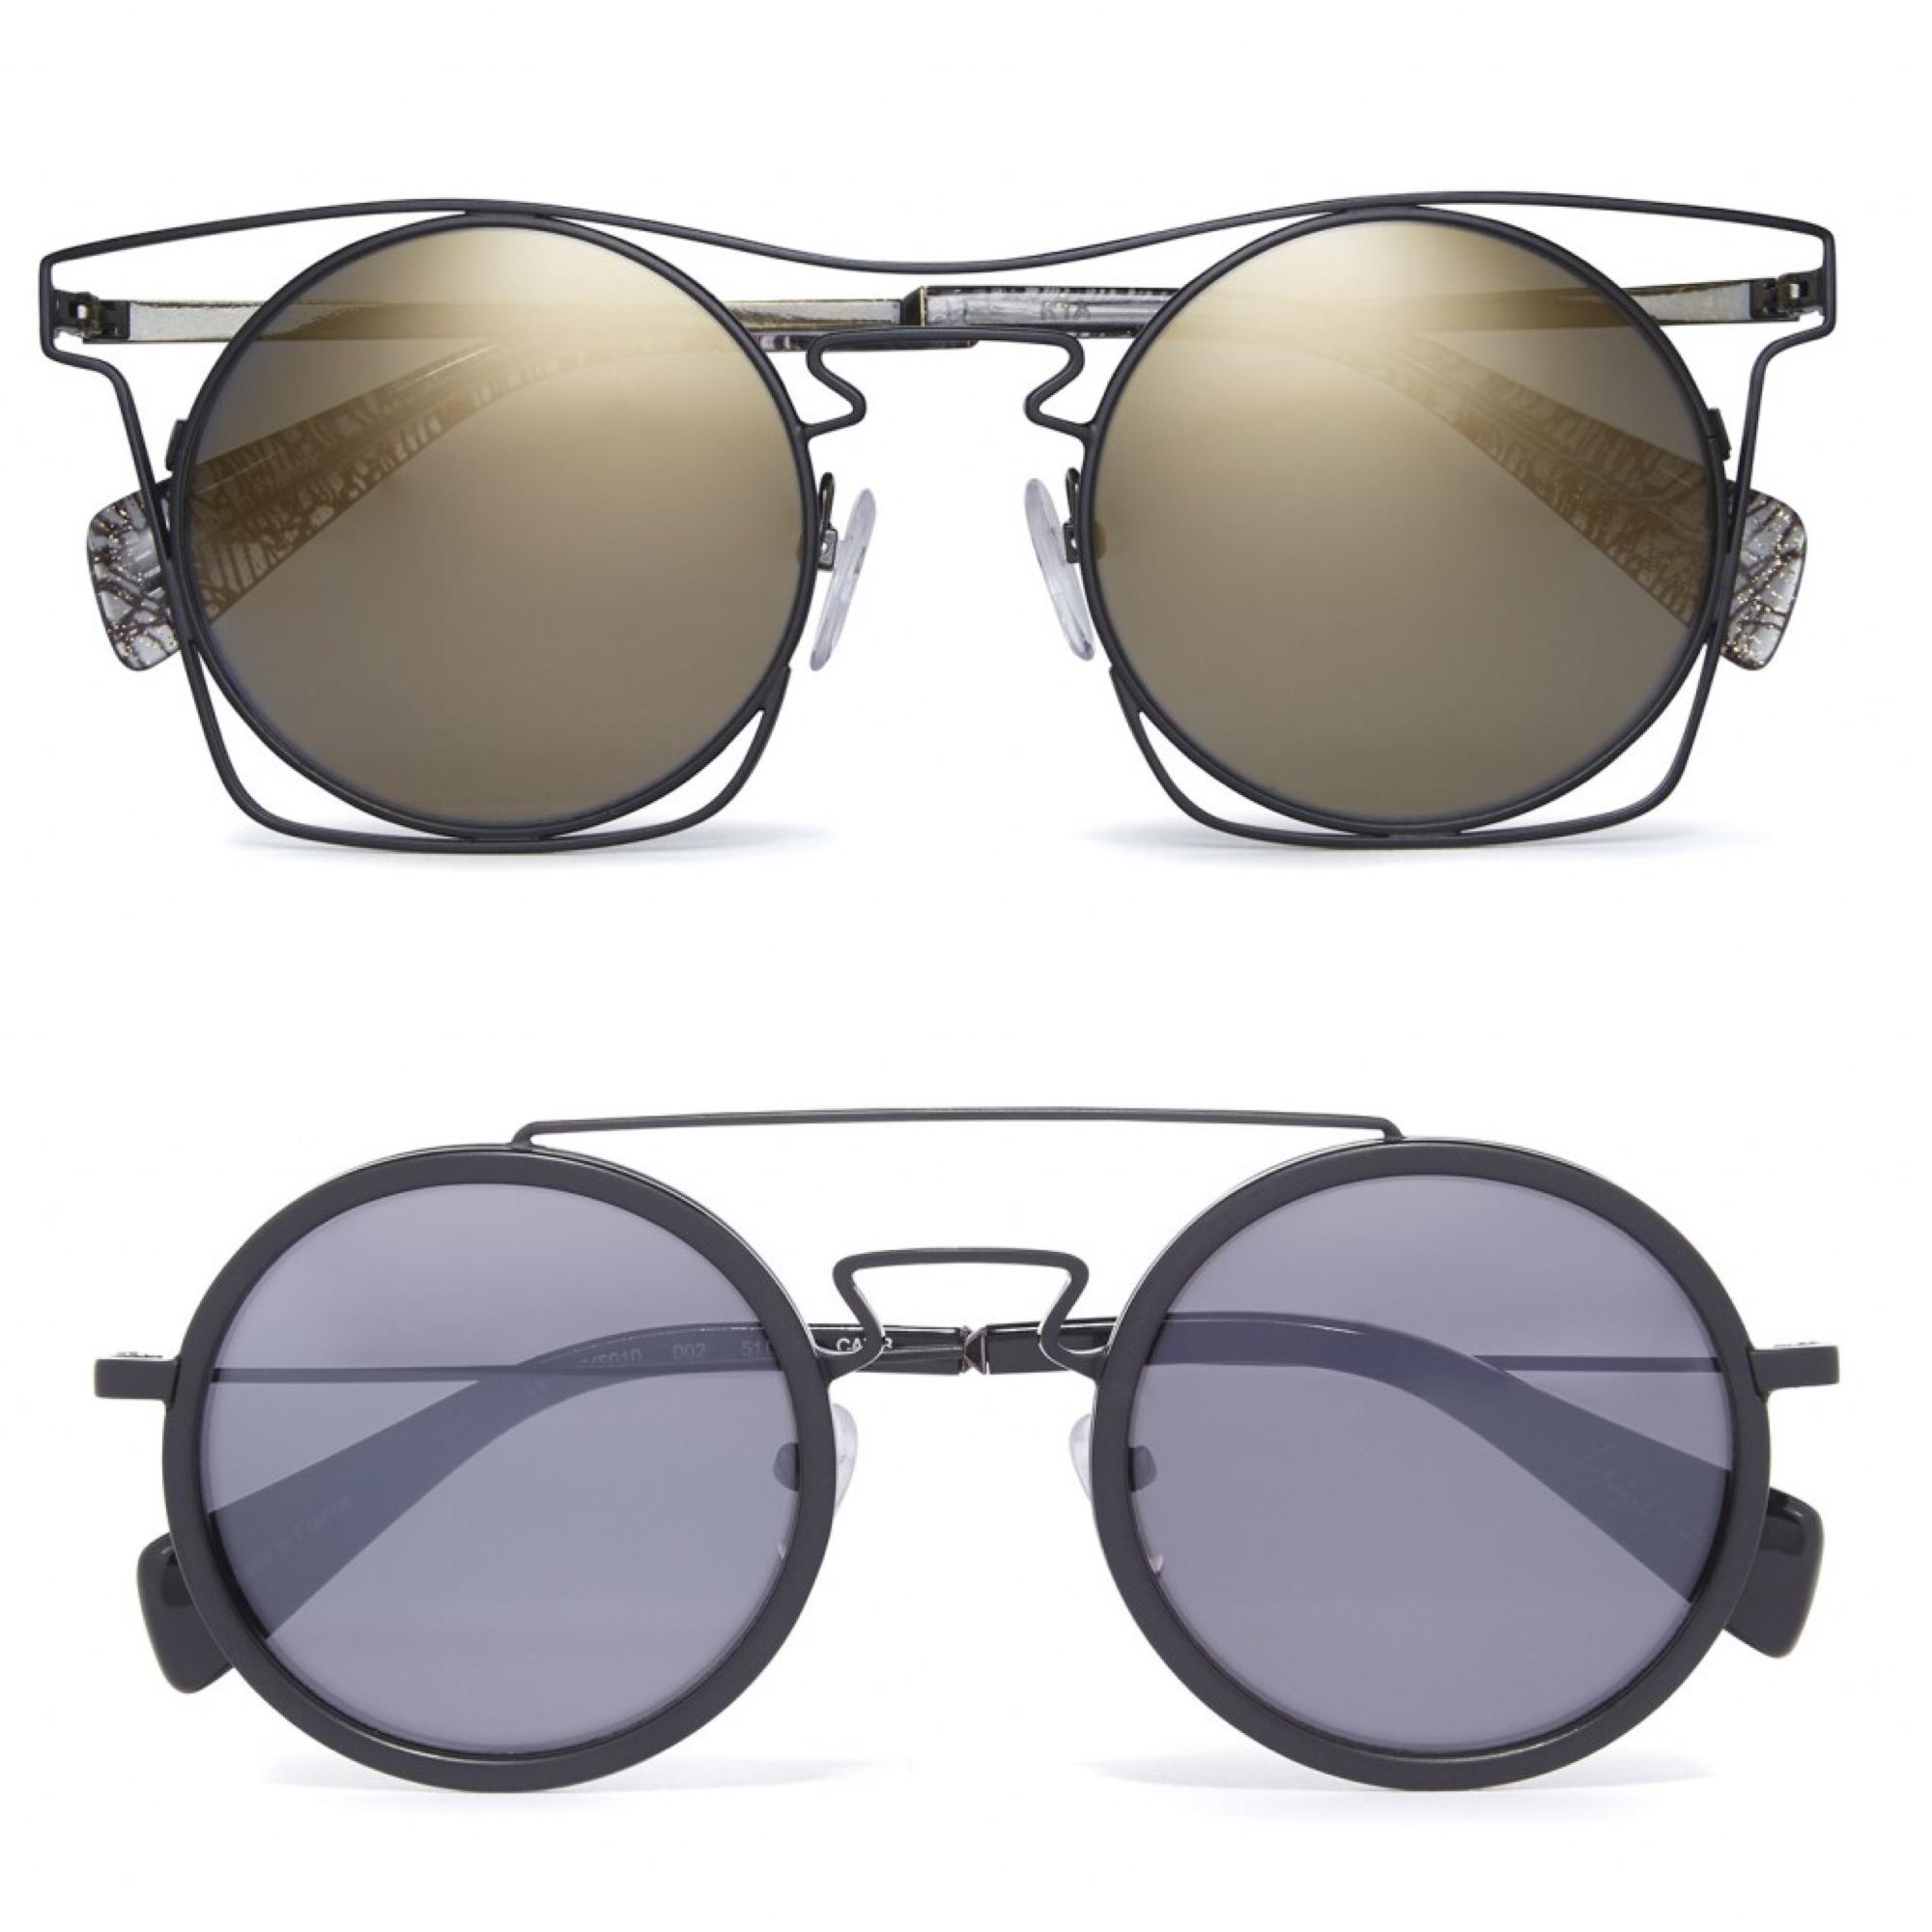 Yohji Yamamoto Spring/Summer 2016 Sunglasses Collection